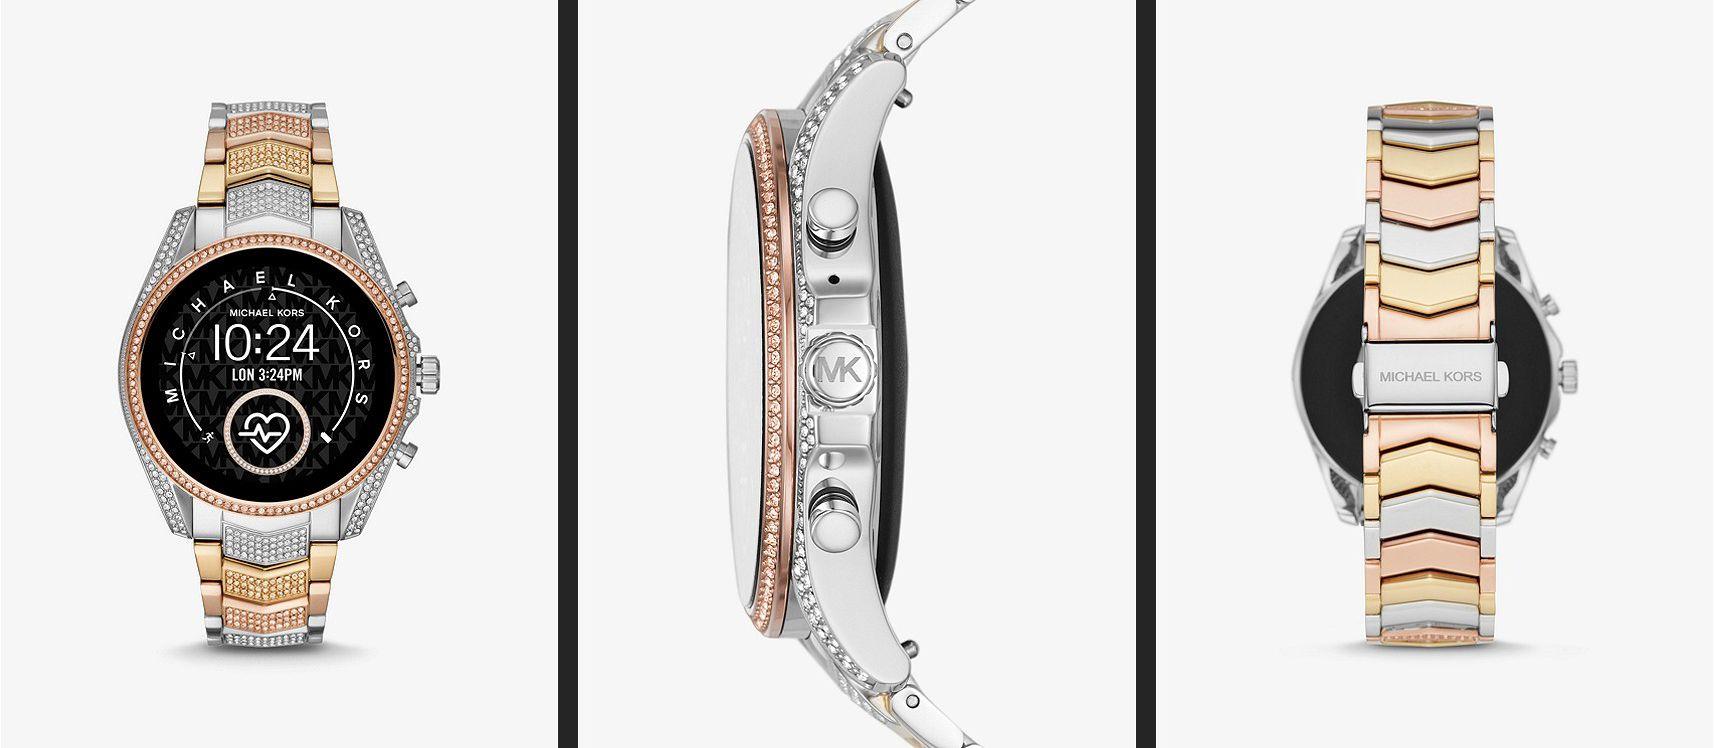 Michael Kors smartwatch, alternative to the Apple Watch